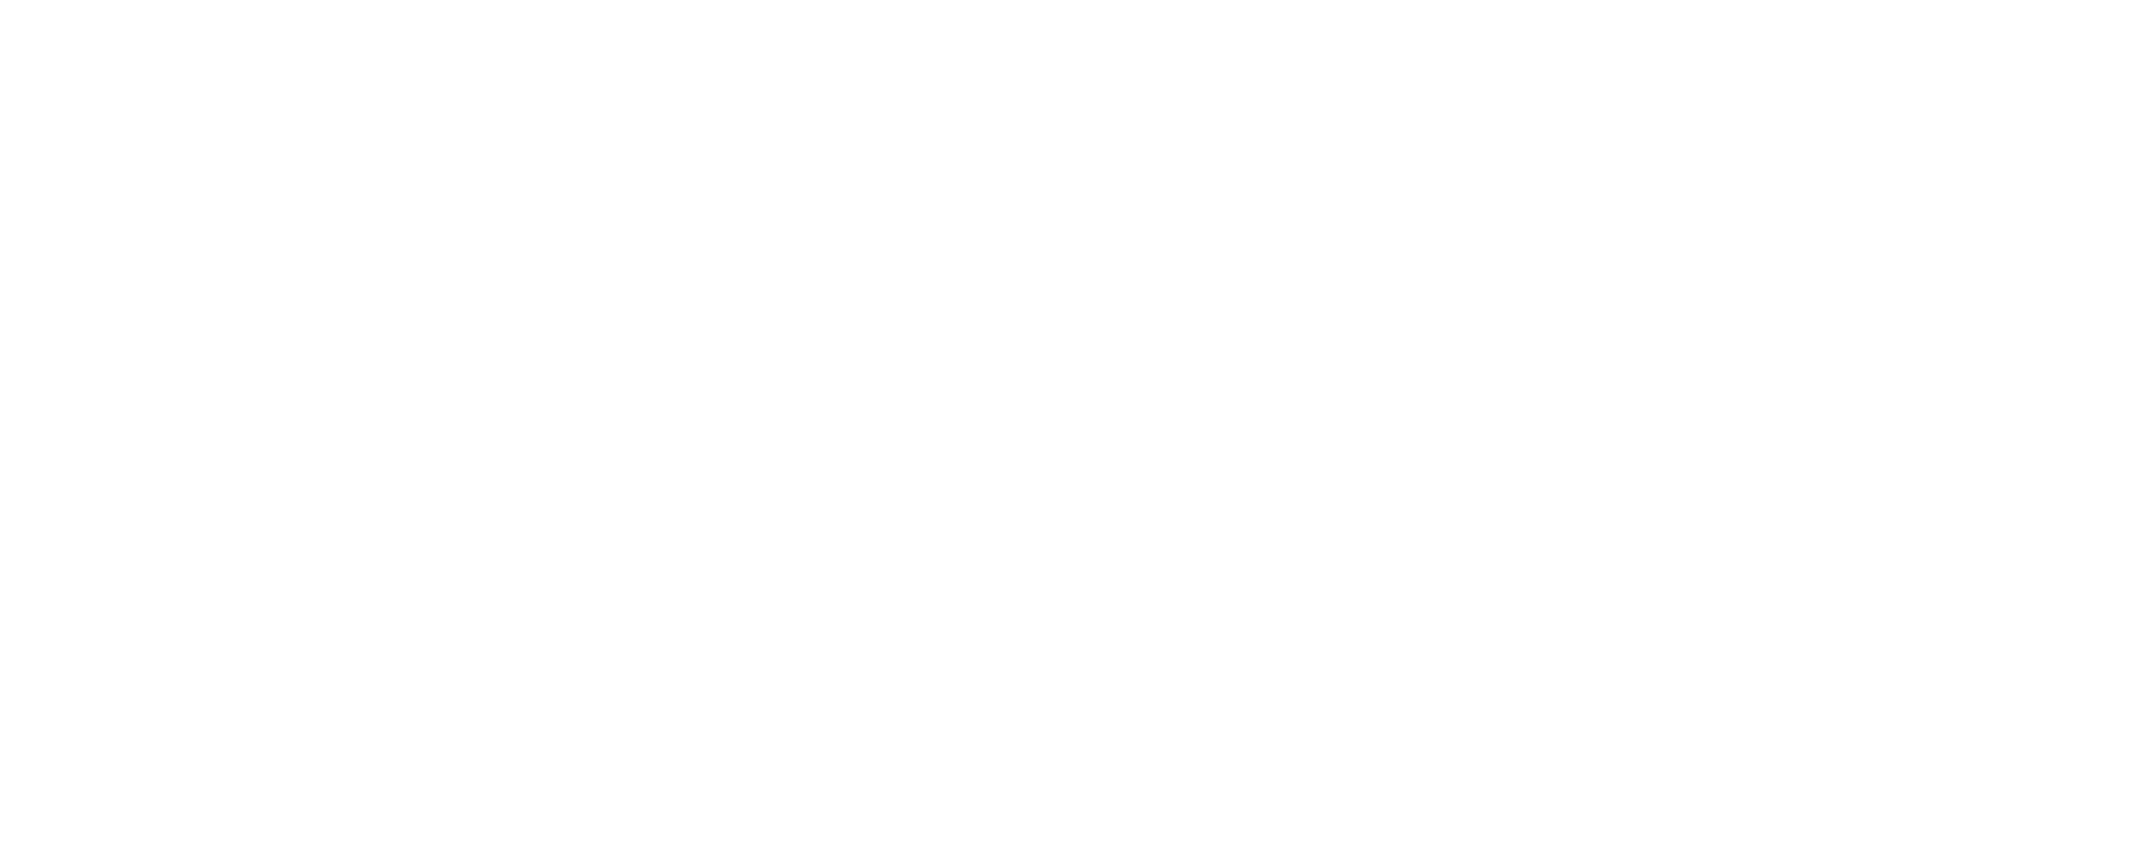 EBEC Mostar